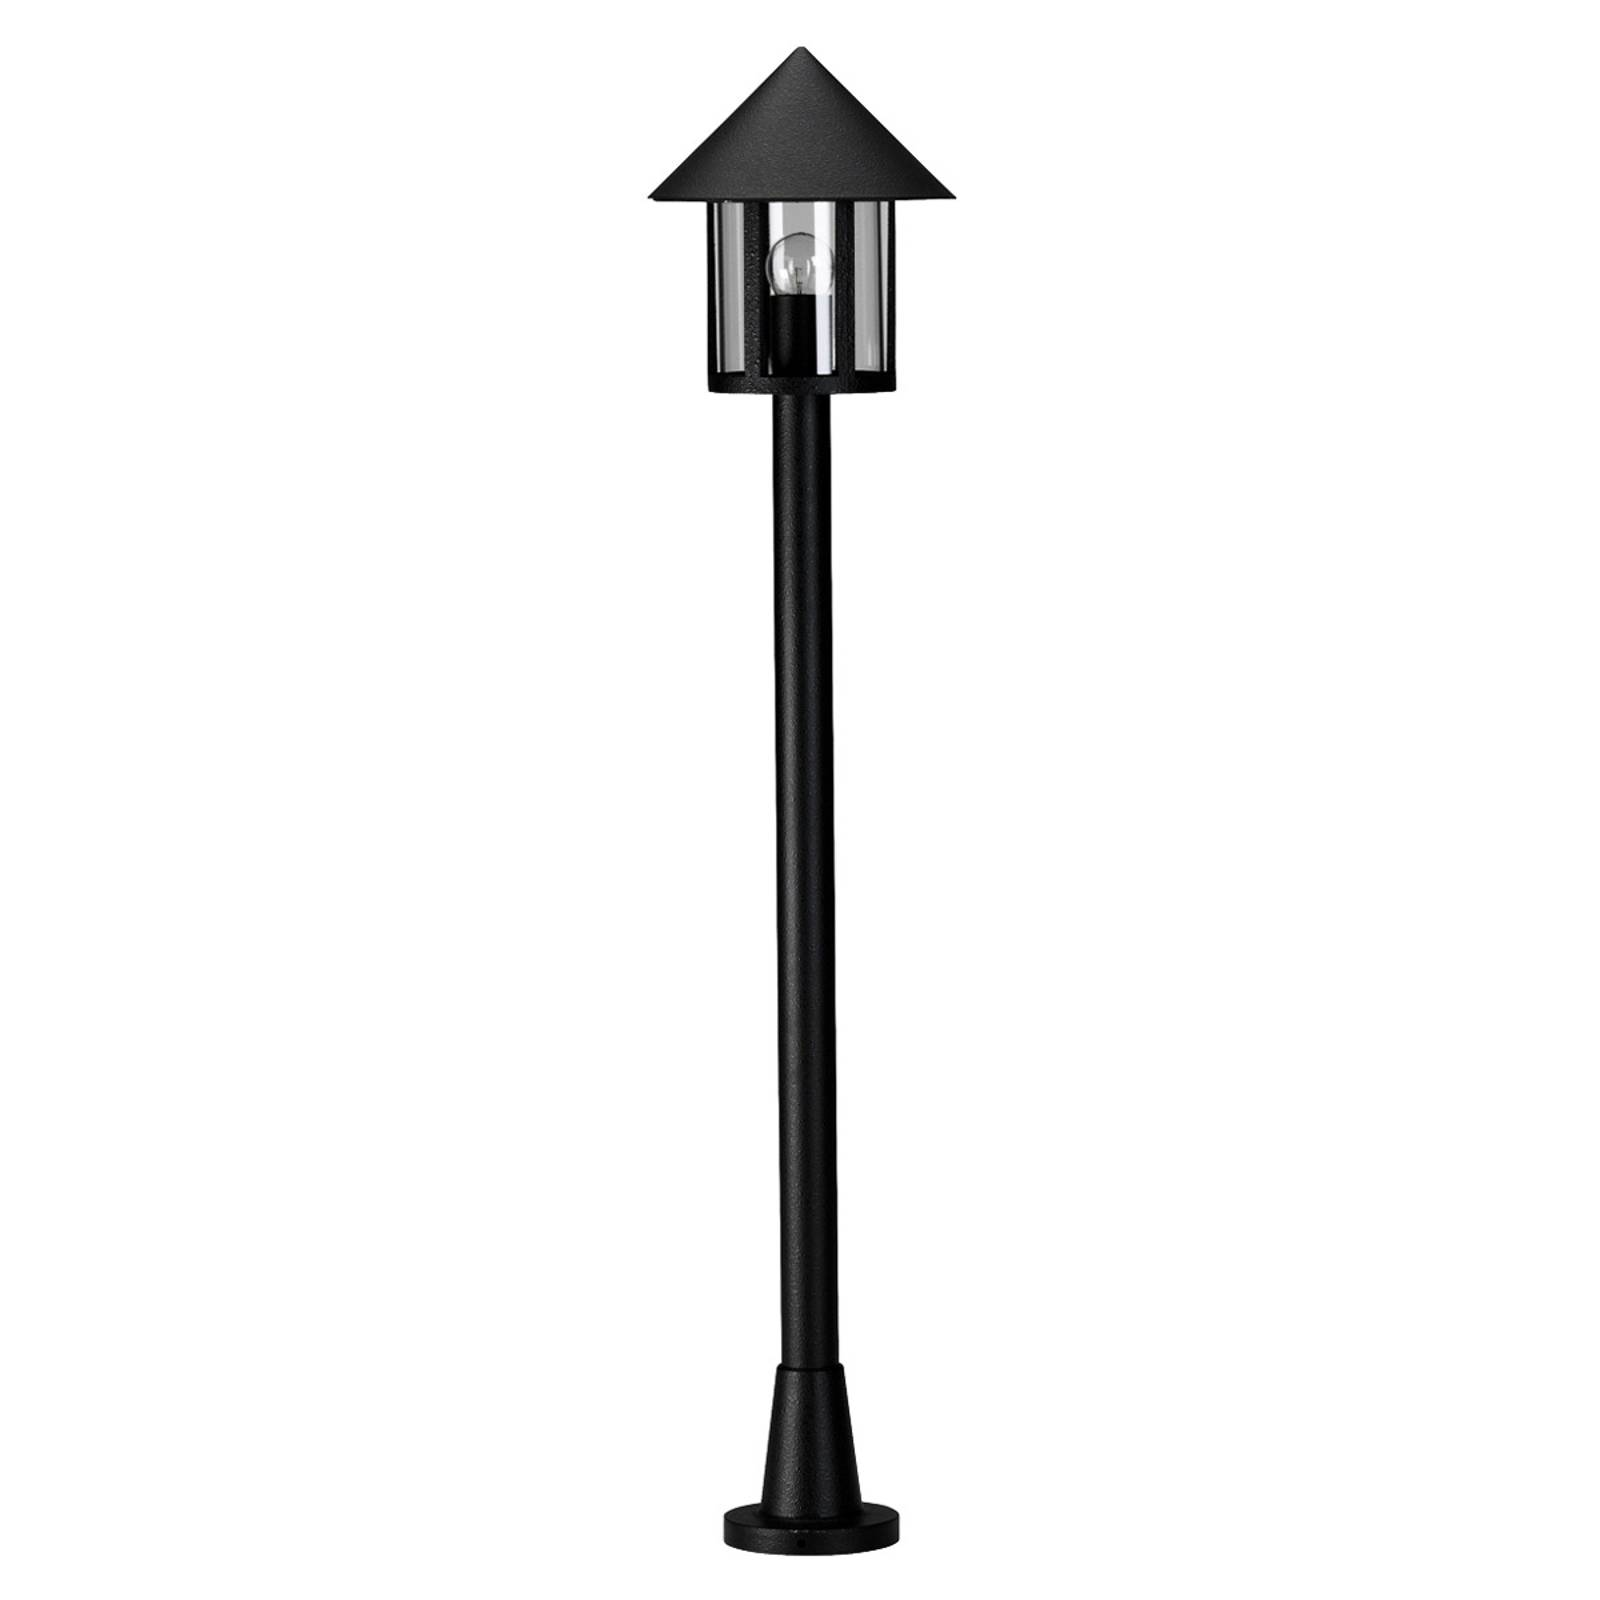 Antieke tuinpadverlichting LAMPIONE zwart